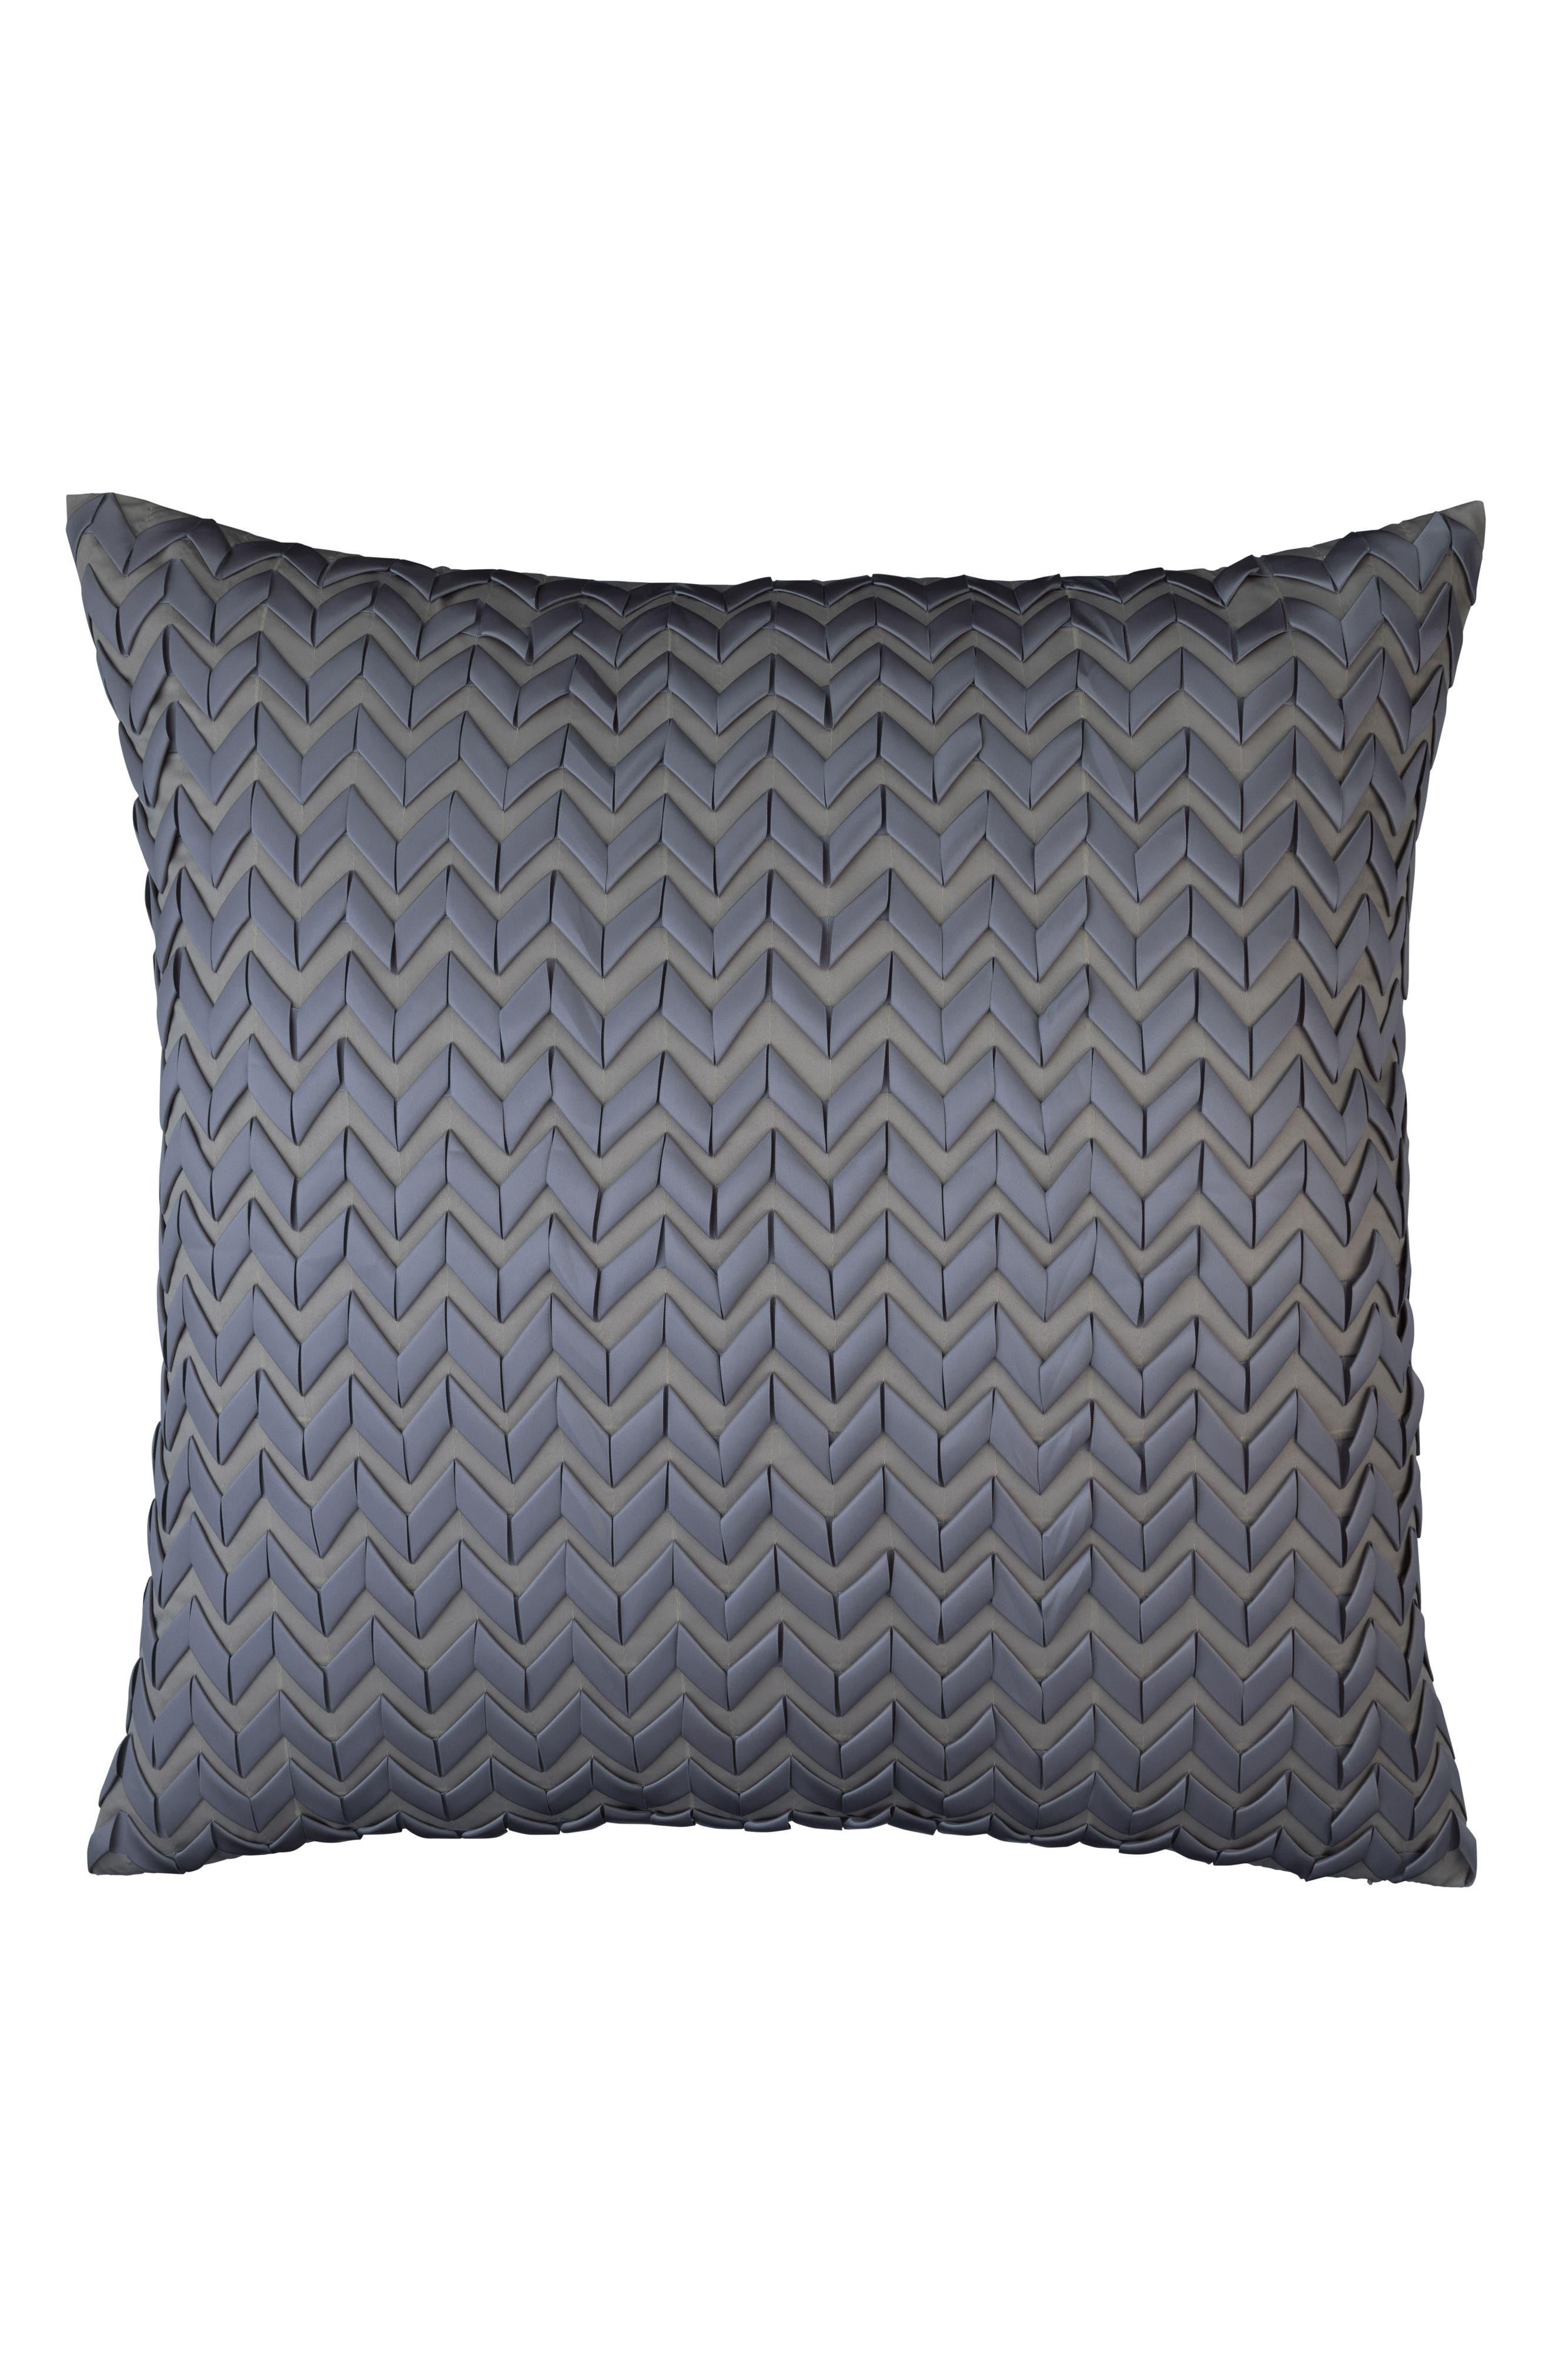 Ultra Ribbon Euro Accent Pillow,                         Main,                         color, GRAY